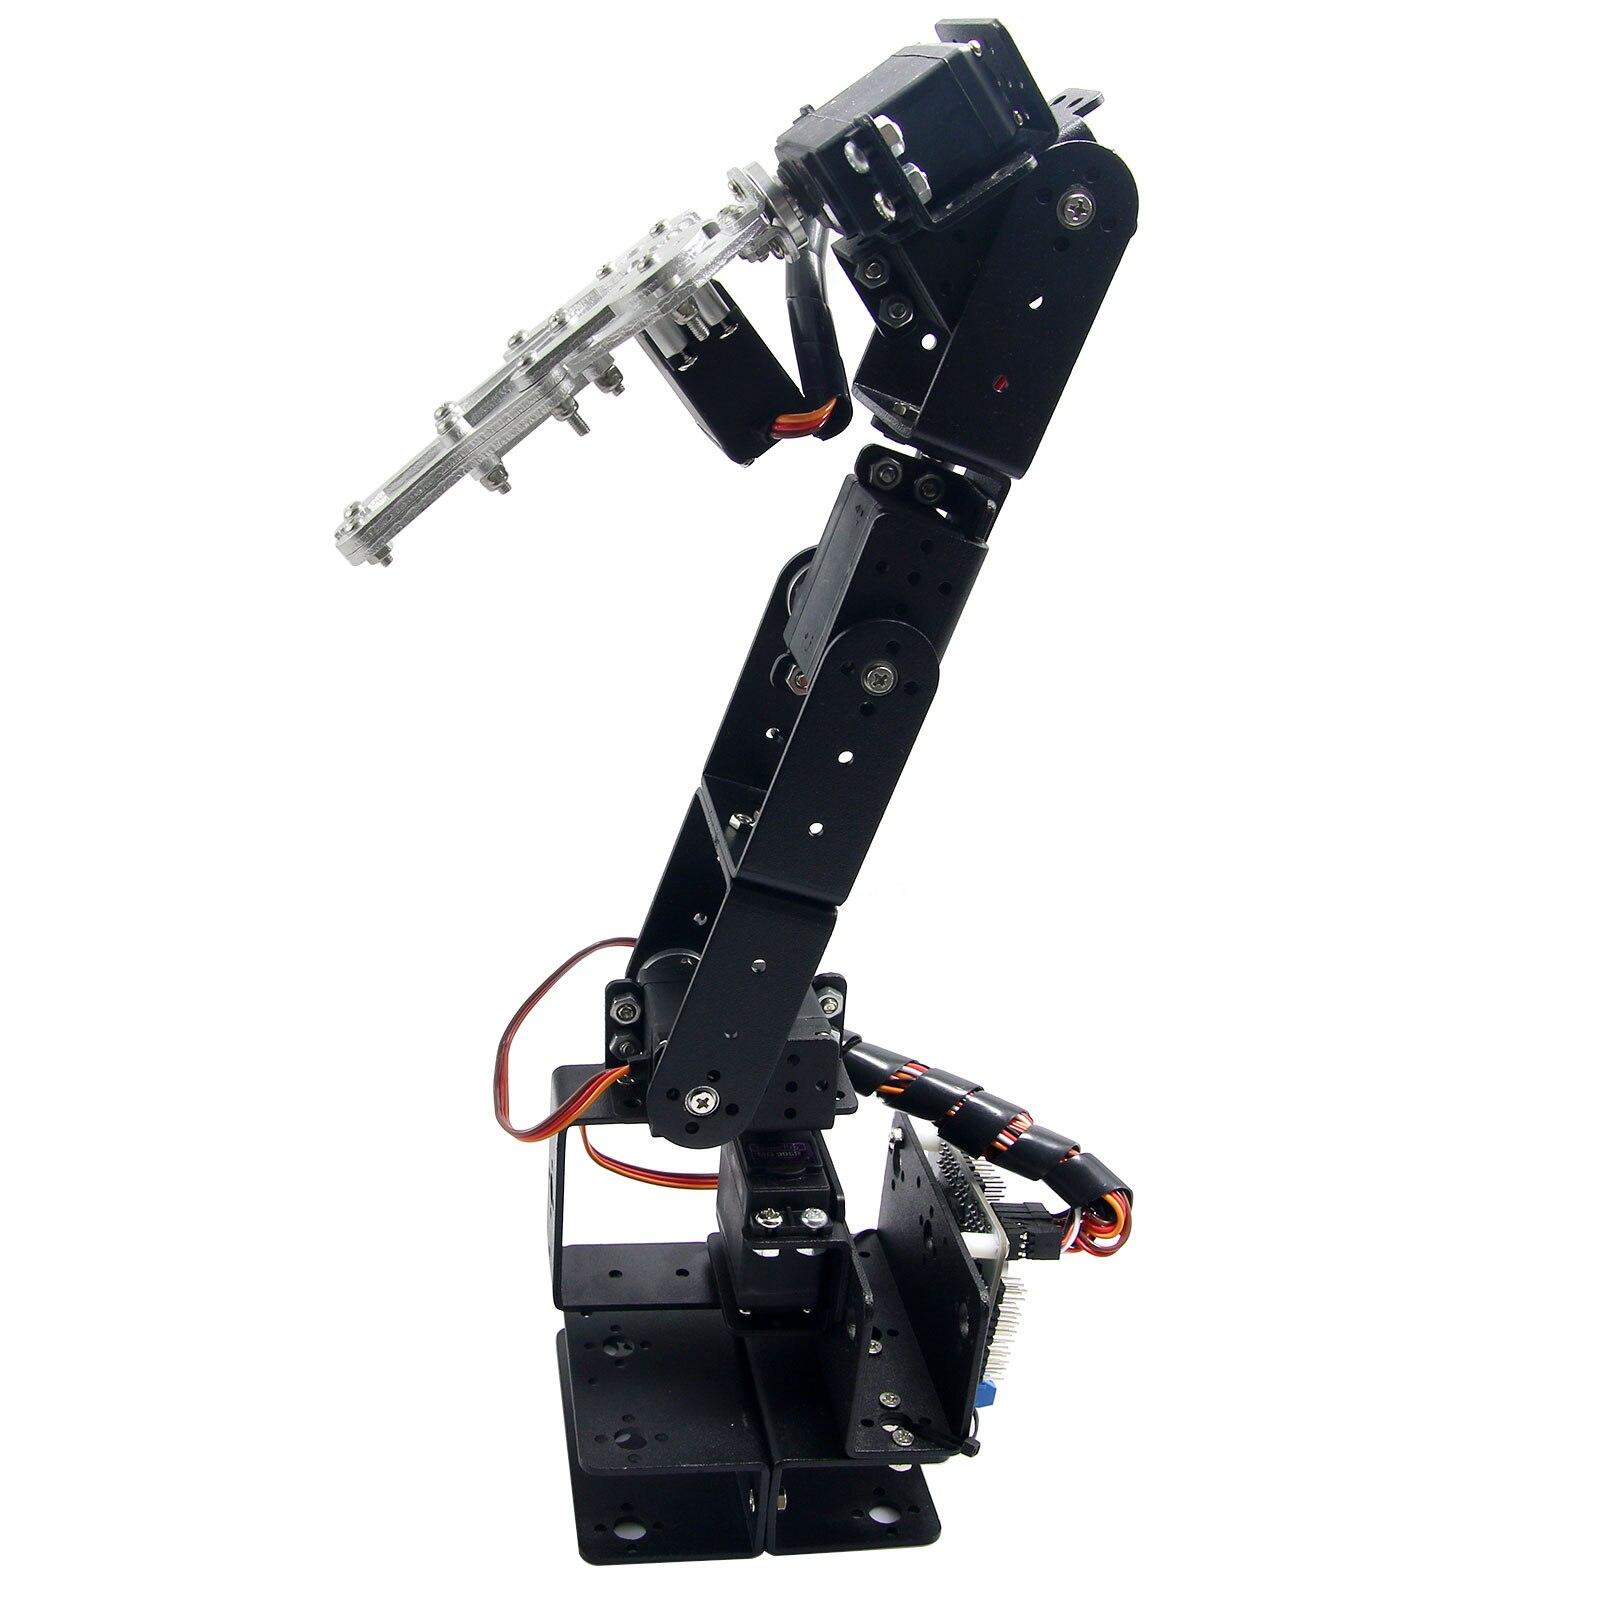 Alumínio Grampo Garra Mount kit robô 6 DOF Braço Robótico Mecânico com Metal Servo Chifre para Arduino